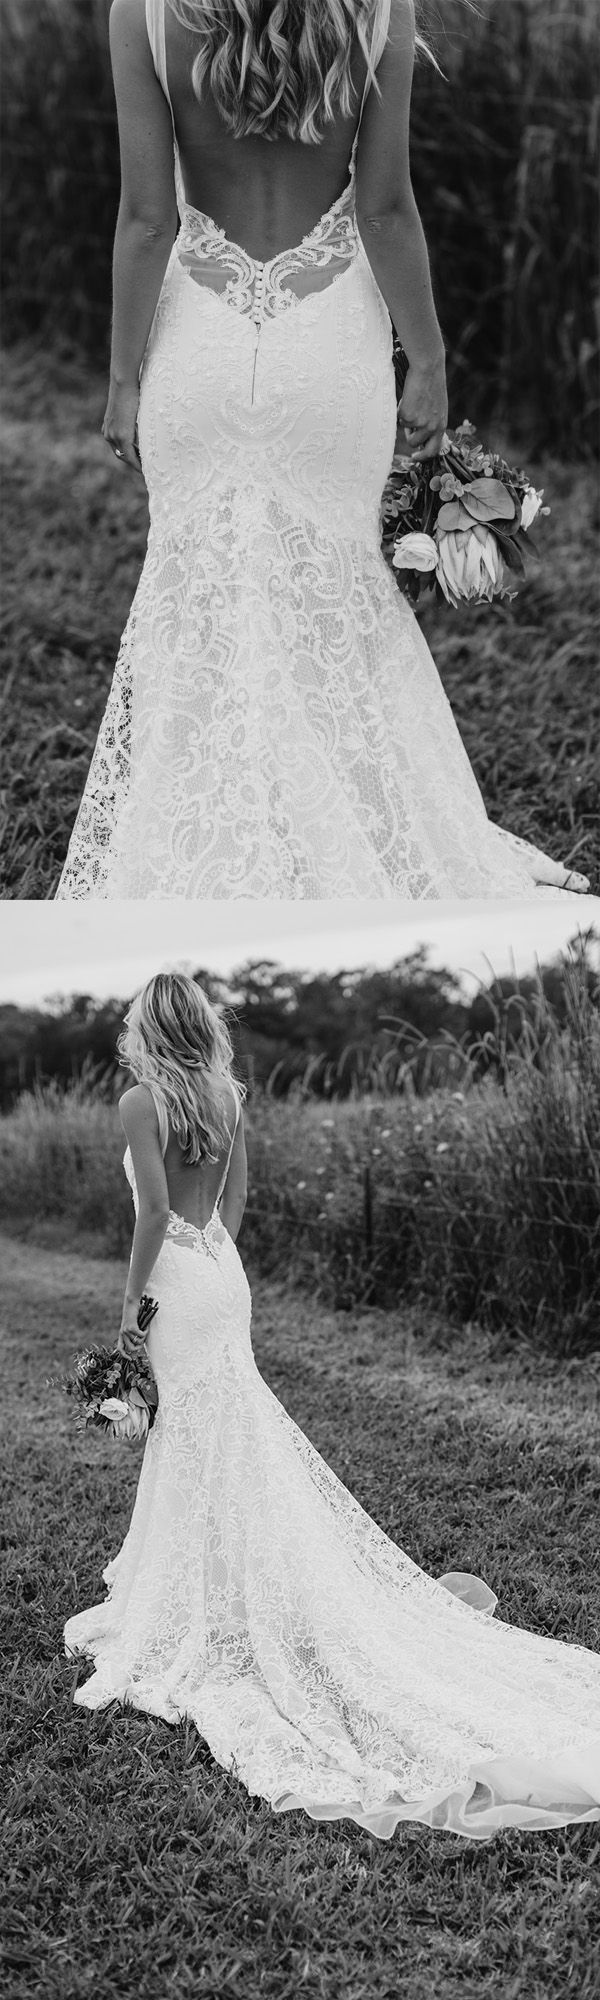 Low Back Wedding Dress With Veil : Best ideas about greek wedding dresses on